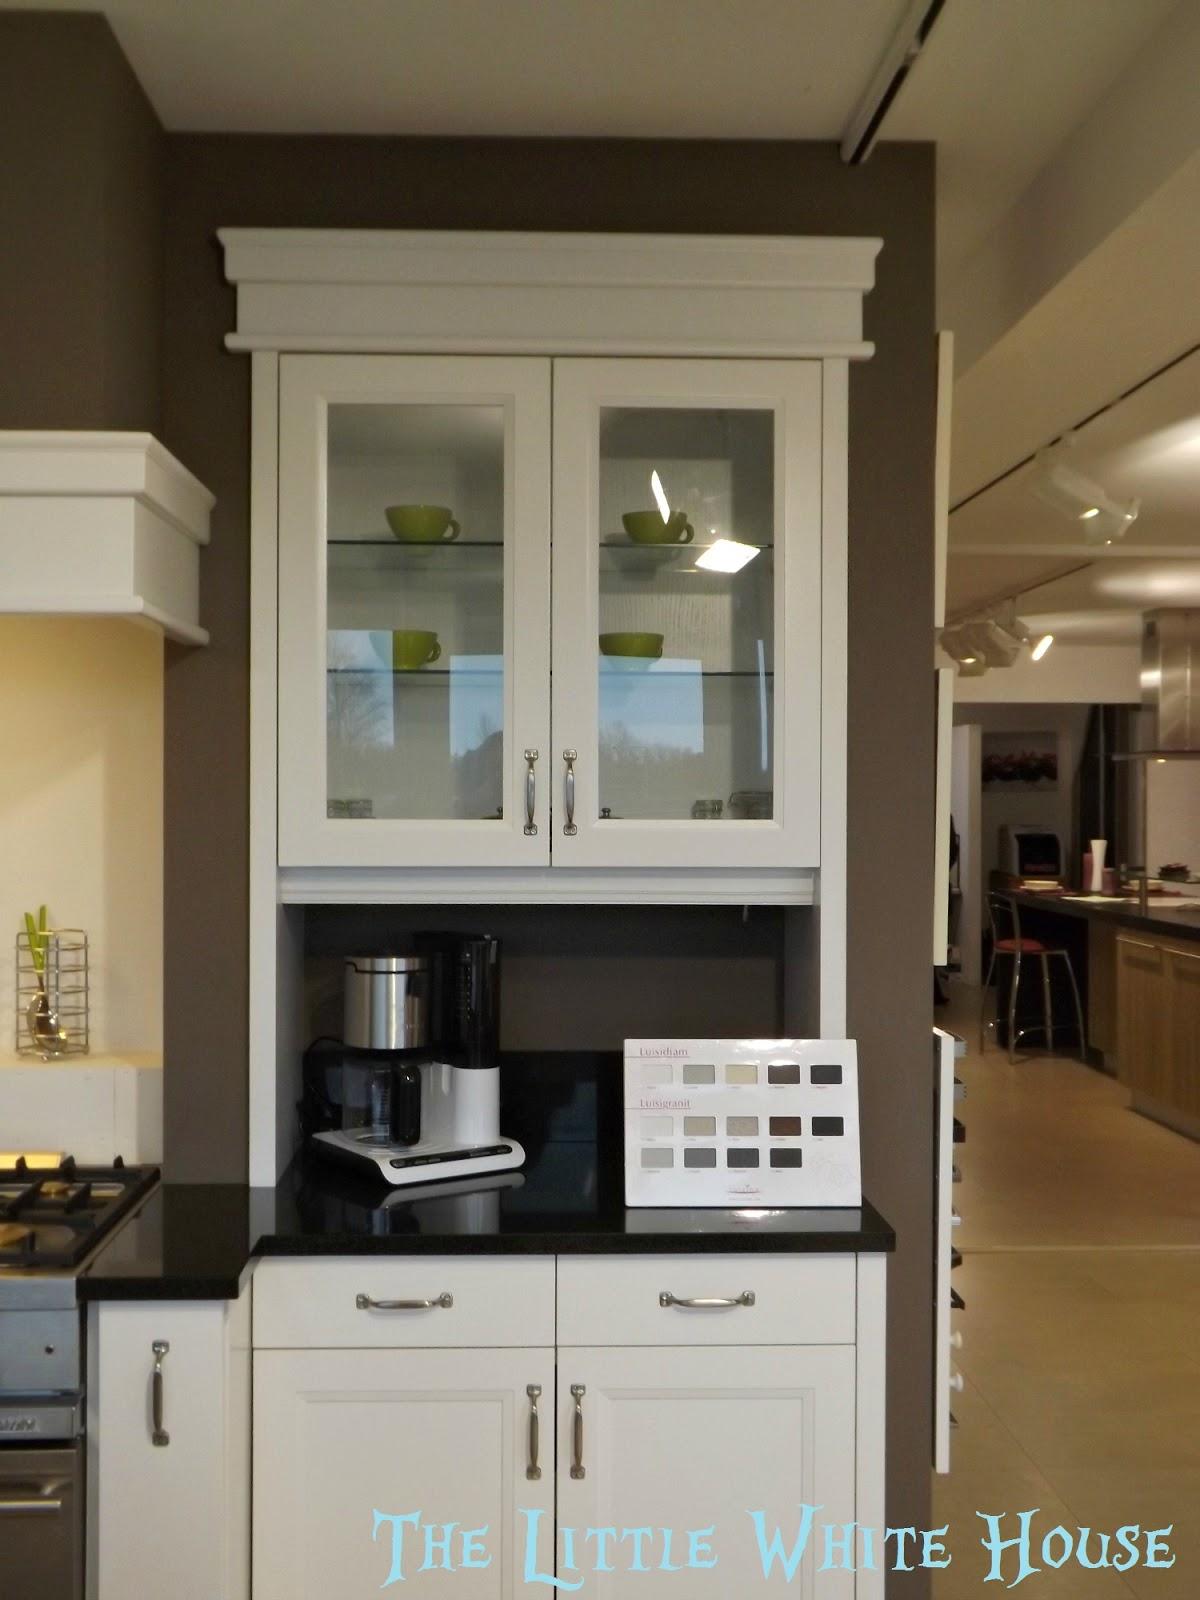 plan de renovation maison. Black Bedroom Furniture Sets. Home Design Ideas